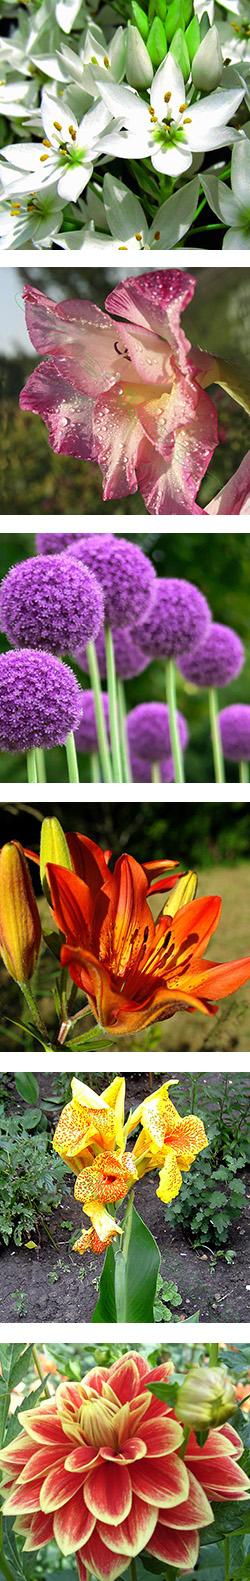 Летние сроки цветения луковичных